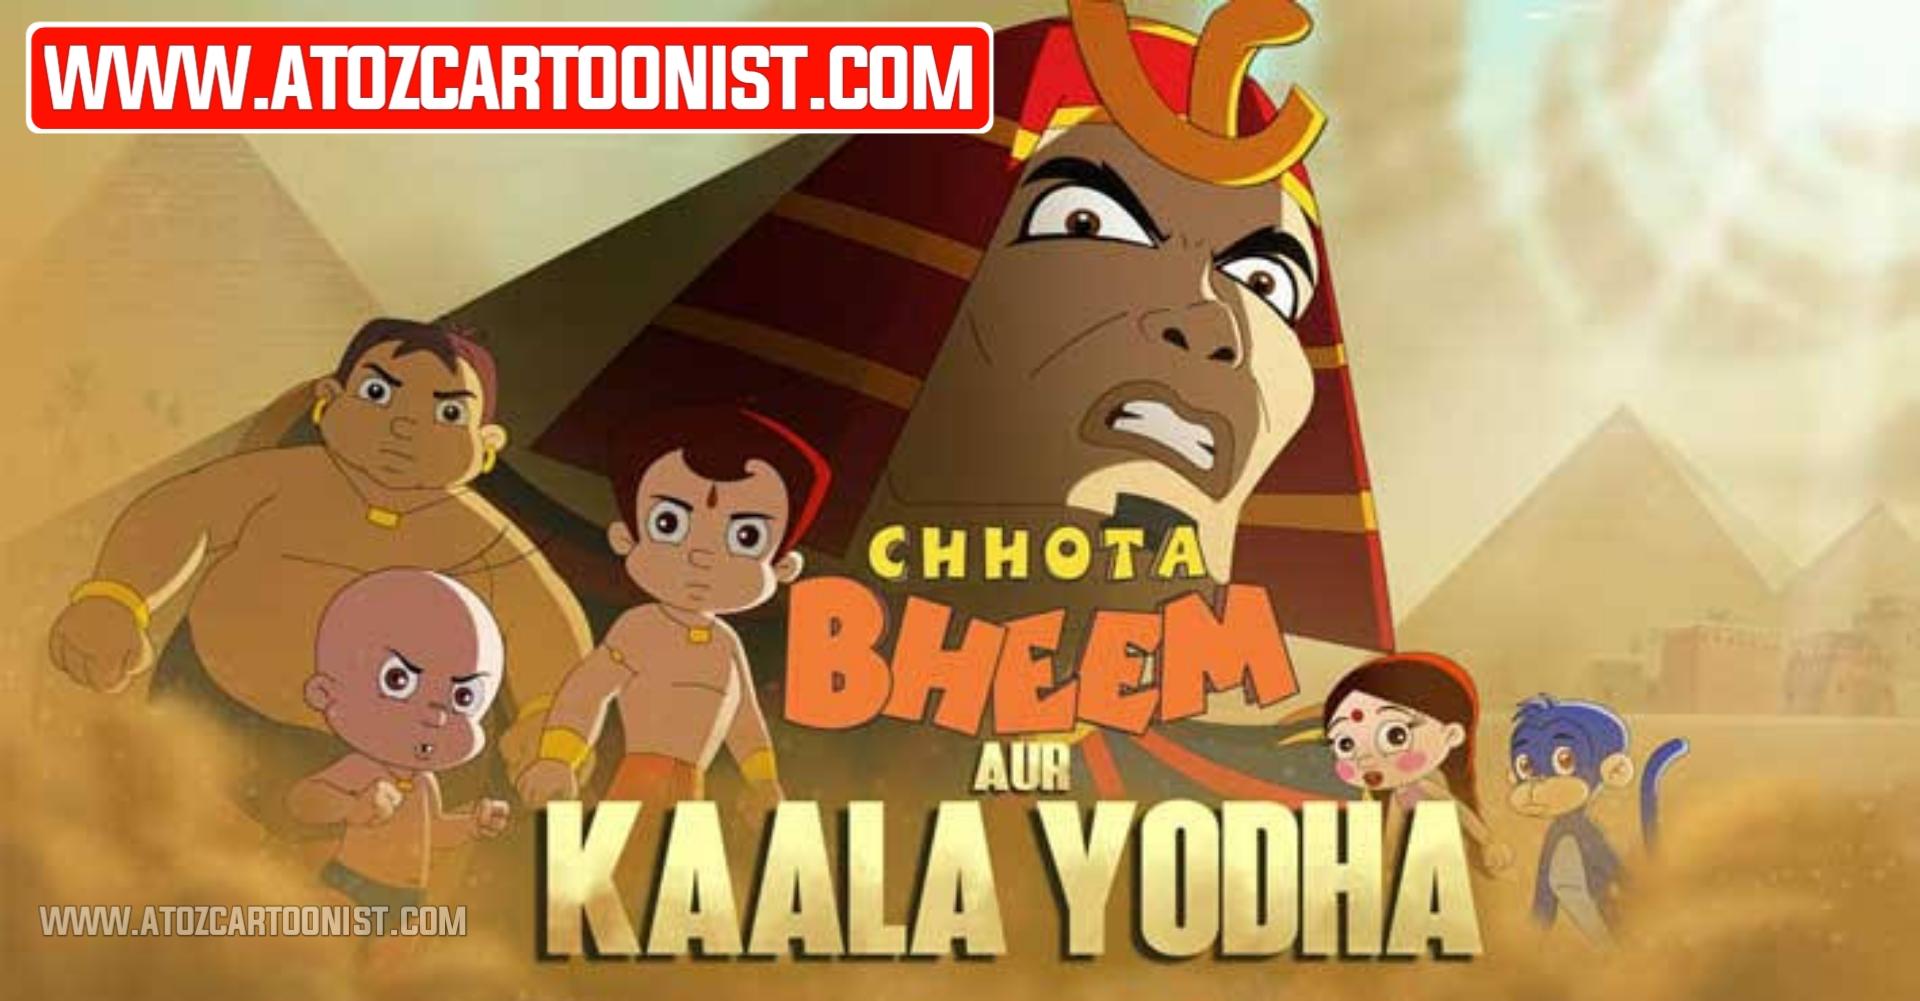 CHHOTA BHEEM AUR KAALA YODHA FULL MOVIE IN HINDI & TAMIL DOWNLOAD (480P, 720P & 1080P)